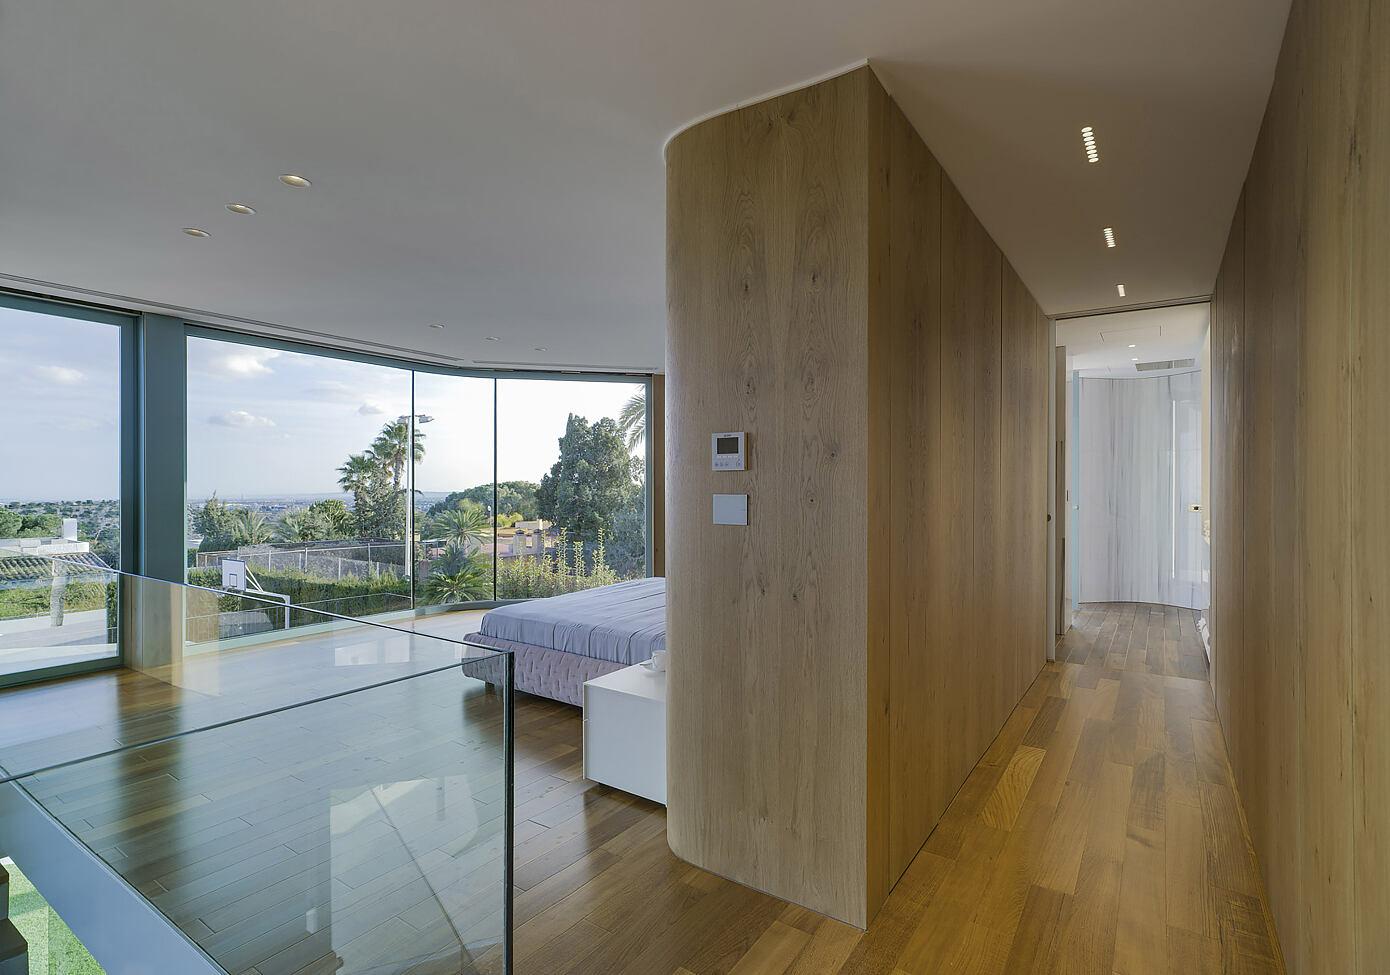 Home in Alicante by WOHA by Antonio Maciá